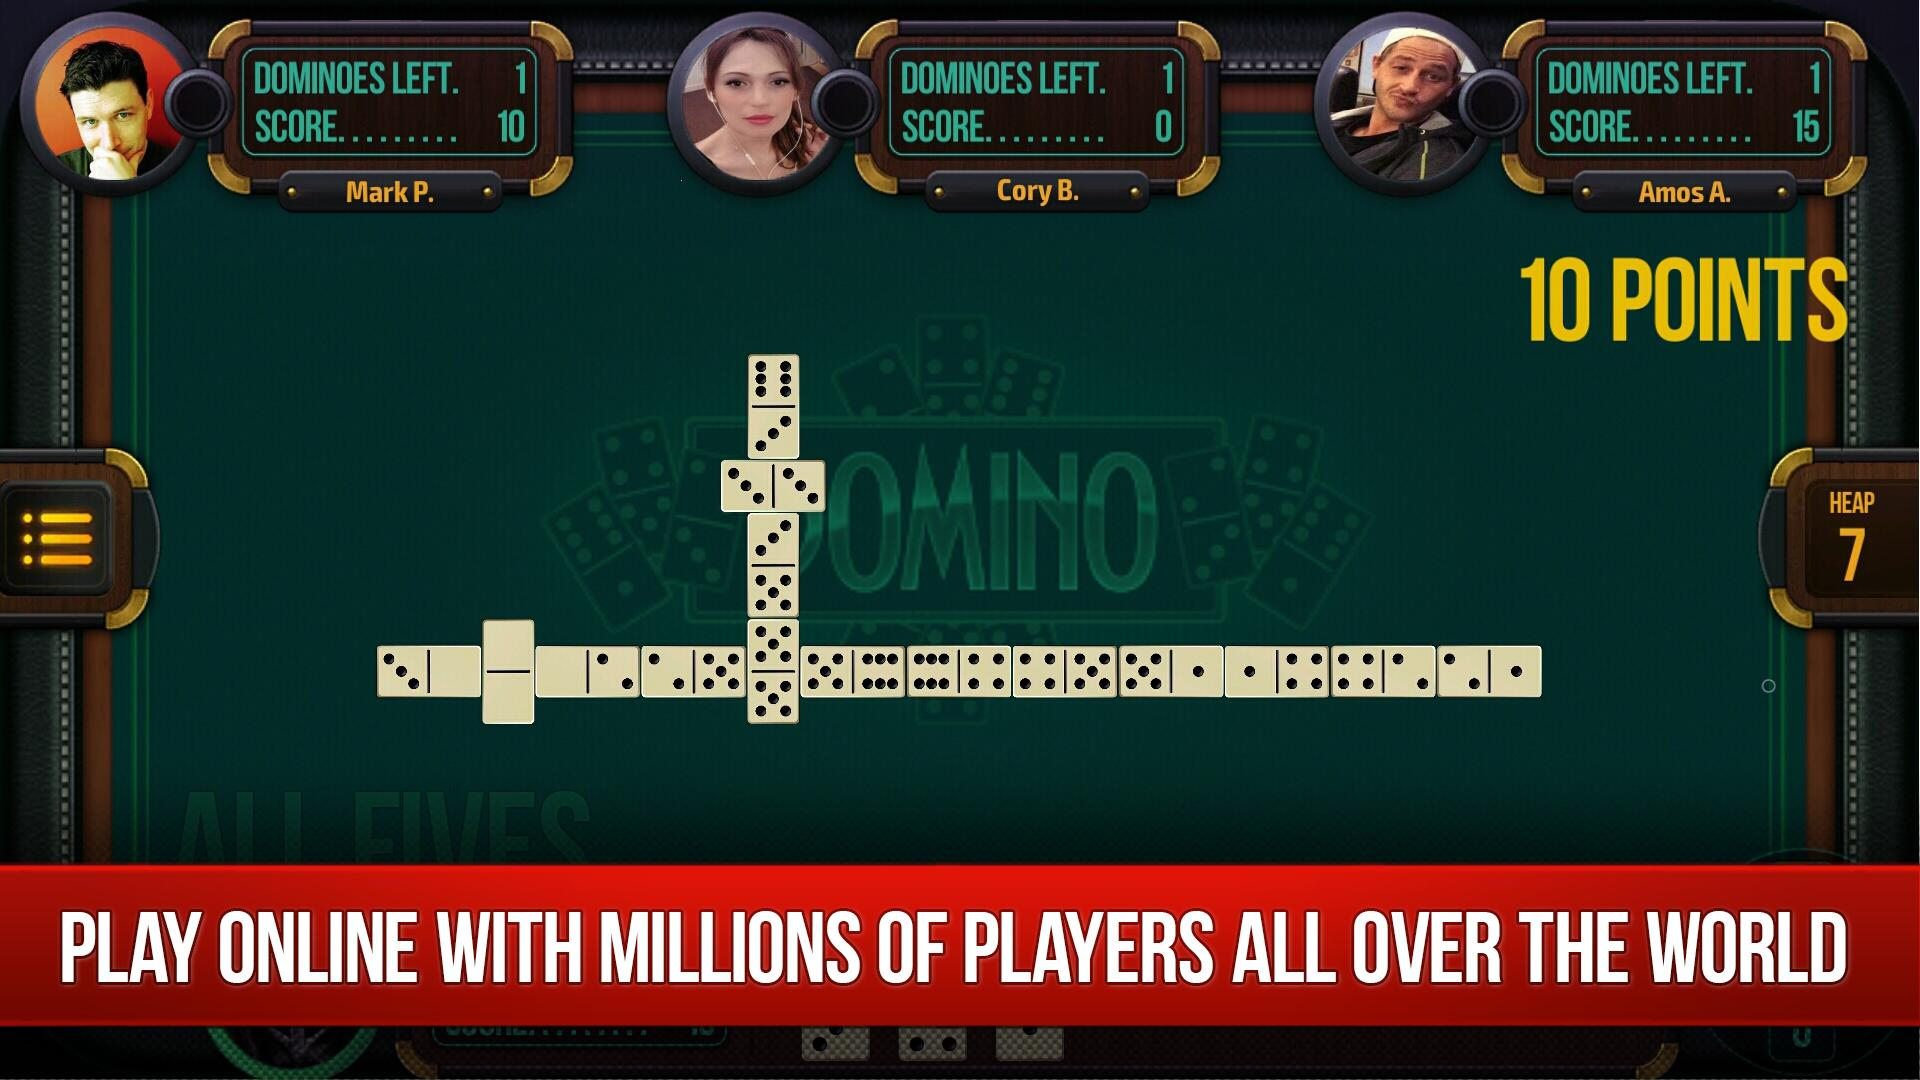 Domino - Dominoes online. Play free Dominos! 2.9.2 Screenshot 11